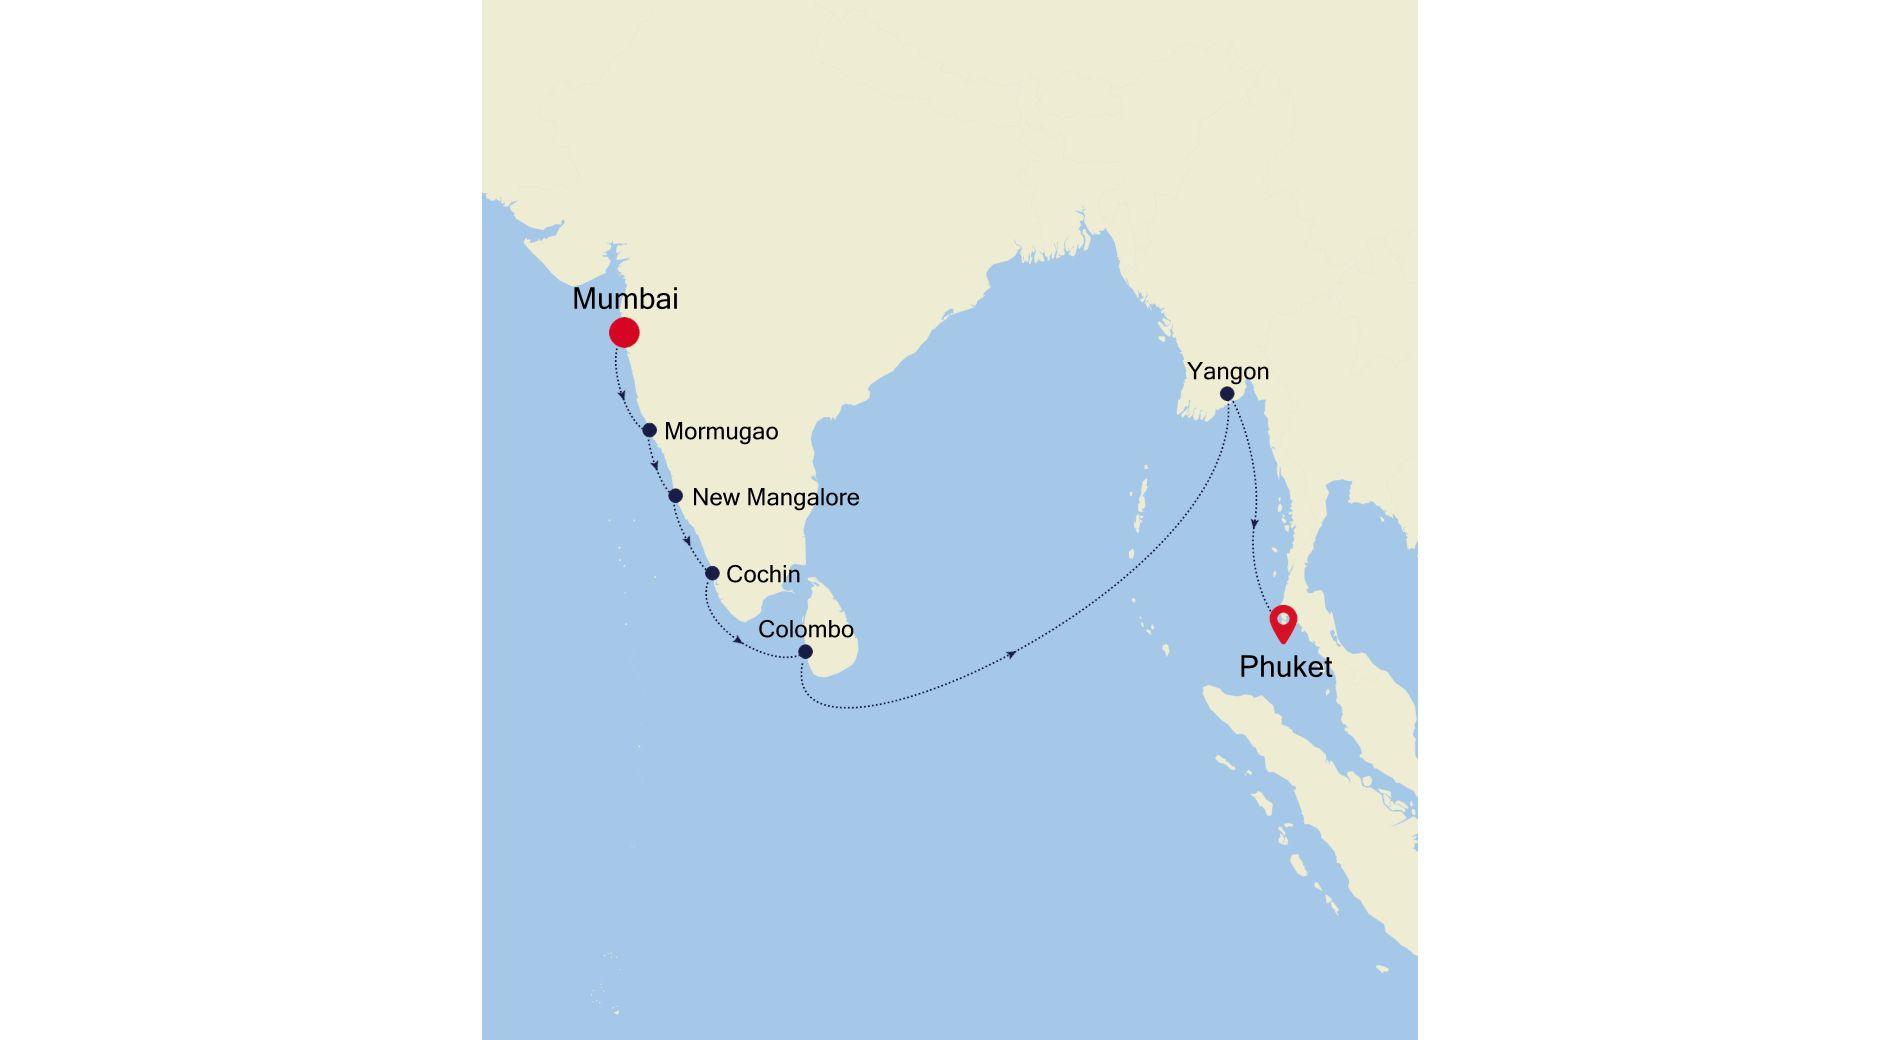 SL201201015 - Mumbai to Phuket